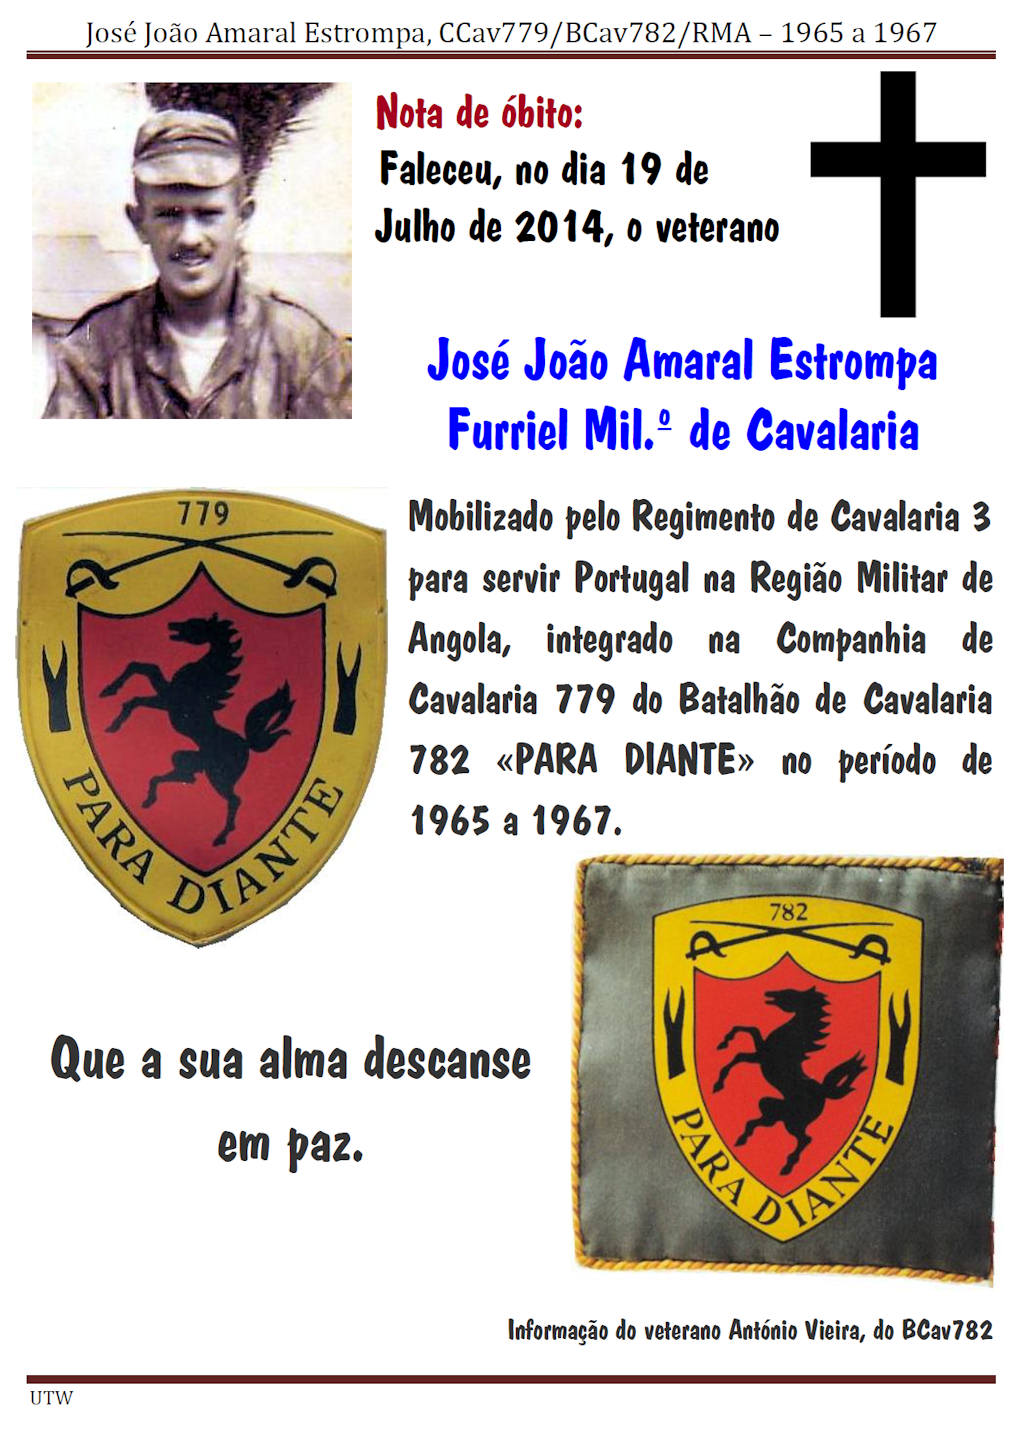 Faleceu o veterano José João Amaral Estrompa da CCav779/BCav782 - 19Jul2014  Josejo10